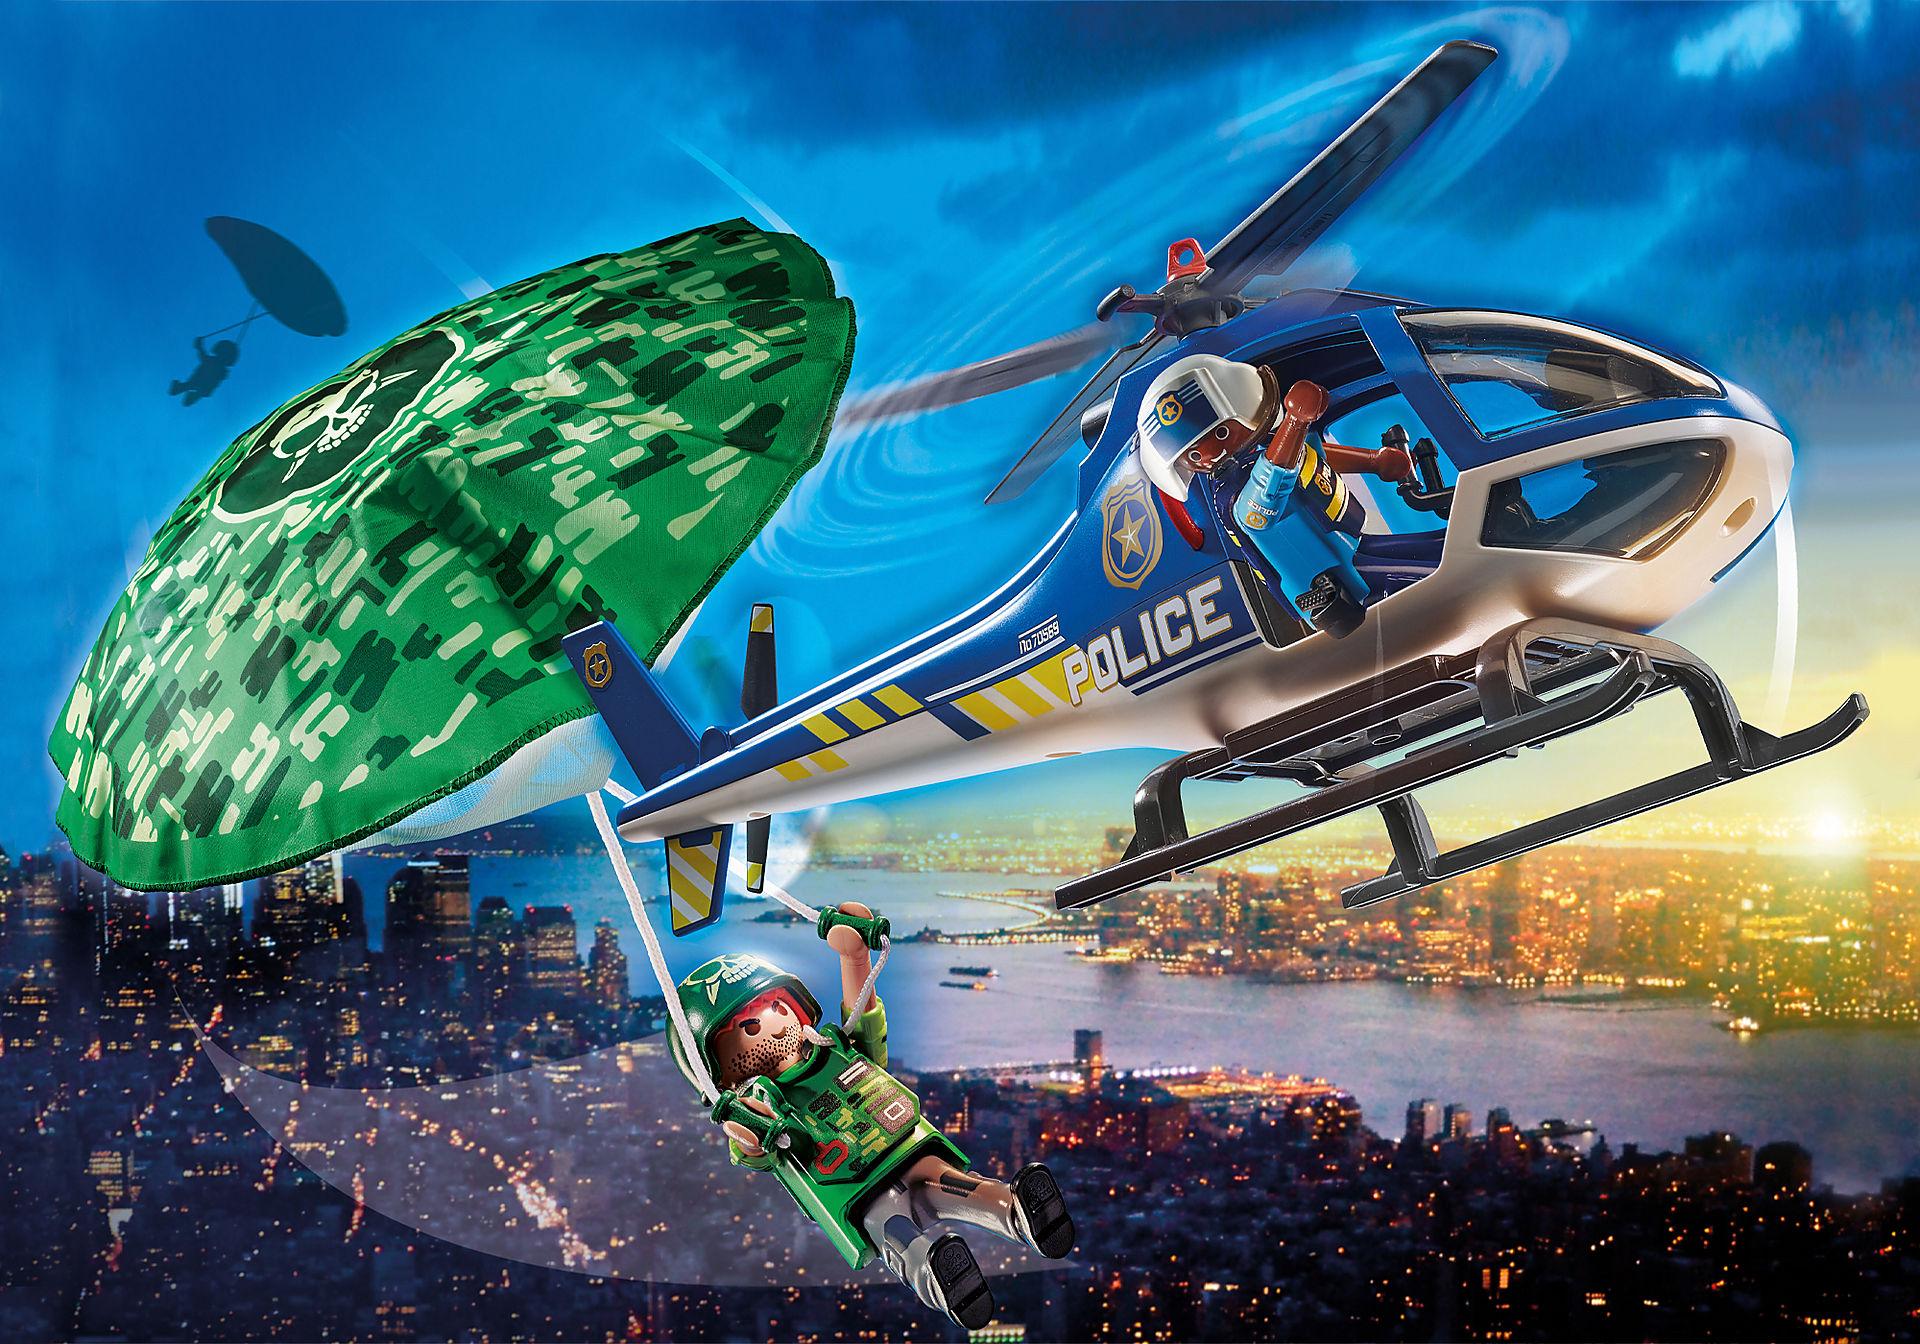 70569 Politiehelikopter: parachute-achtervolging zoom image1